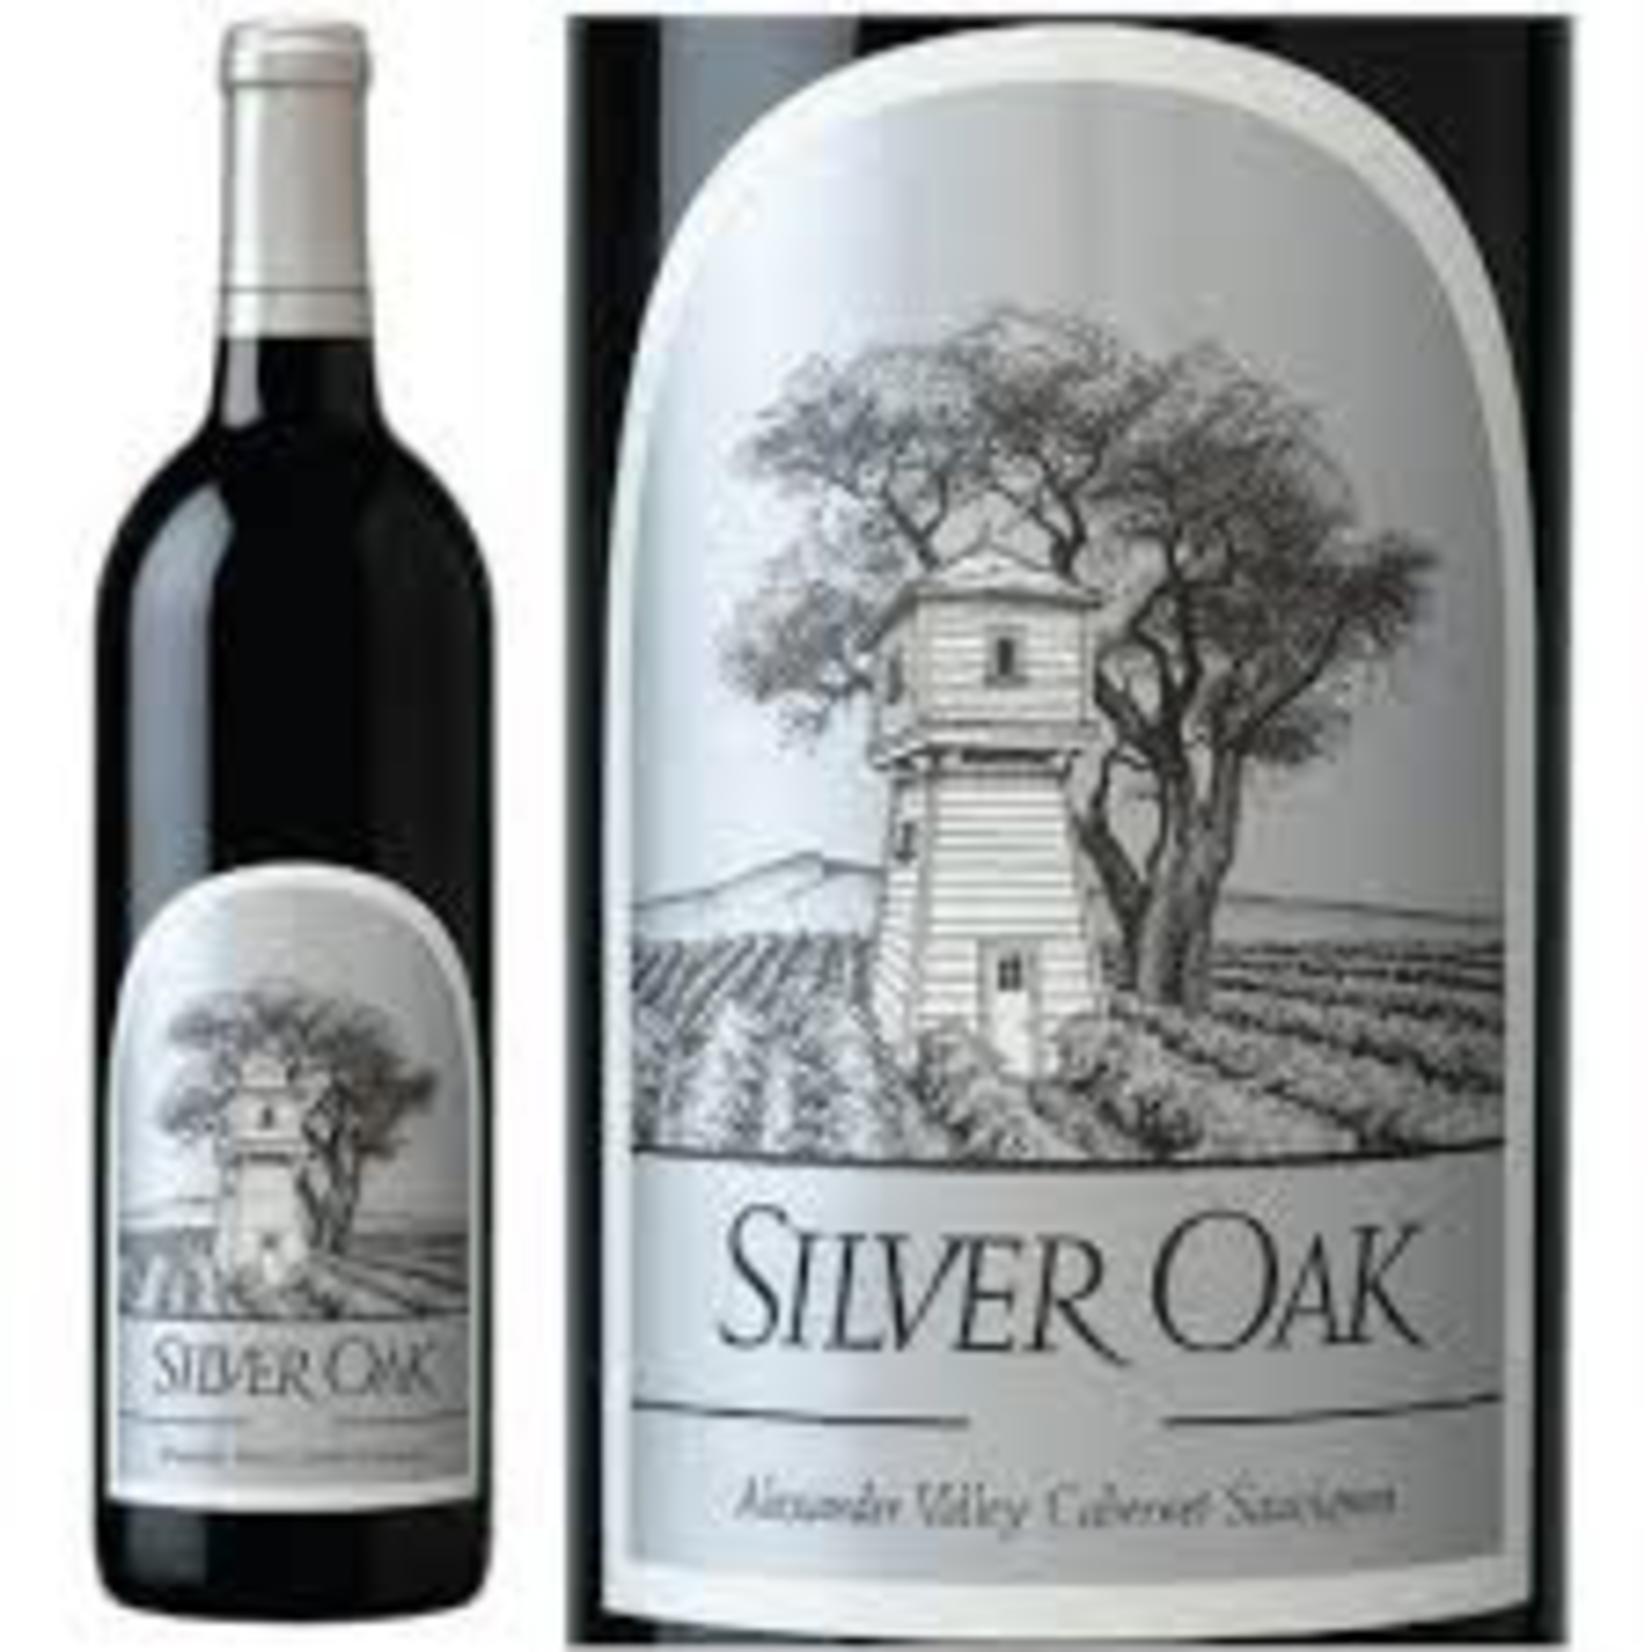 Wine Silver Oak Cabernet Sauvignon Alexander Valley 2016